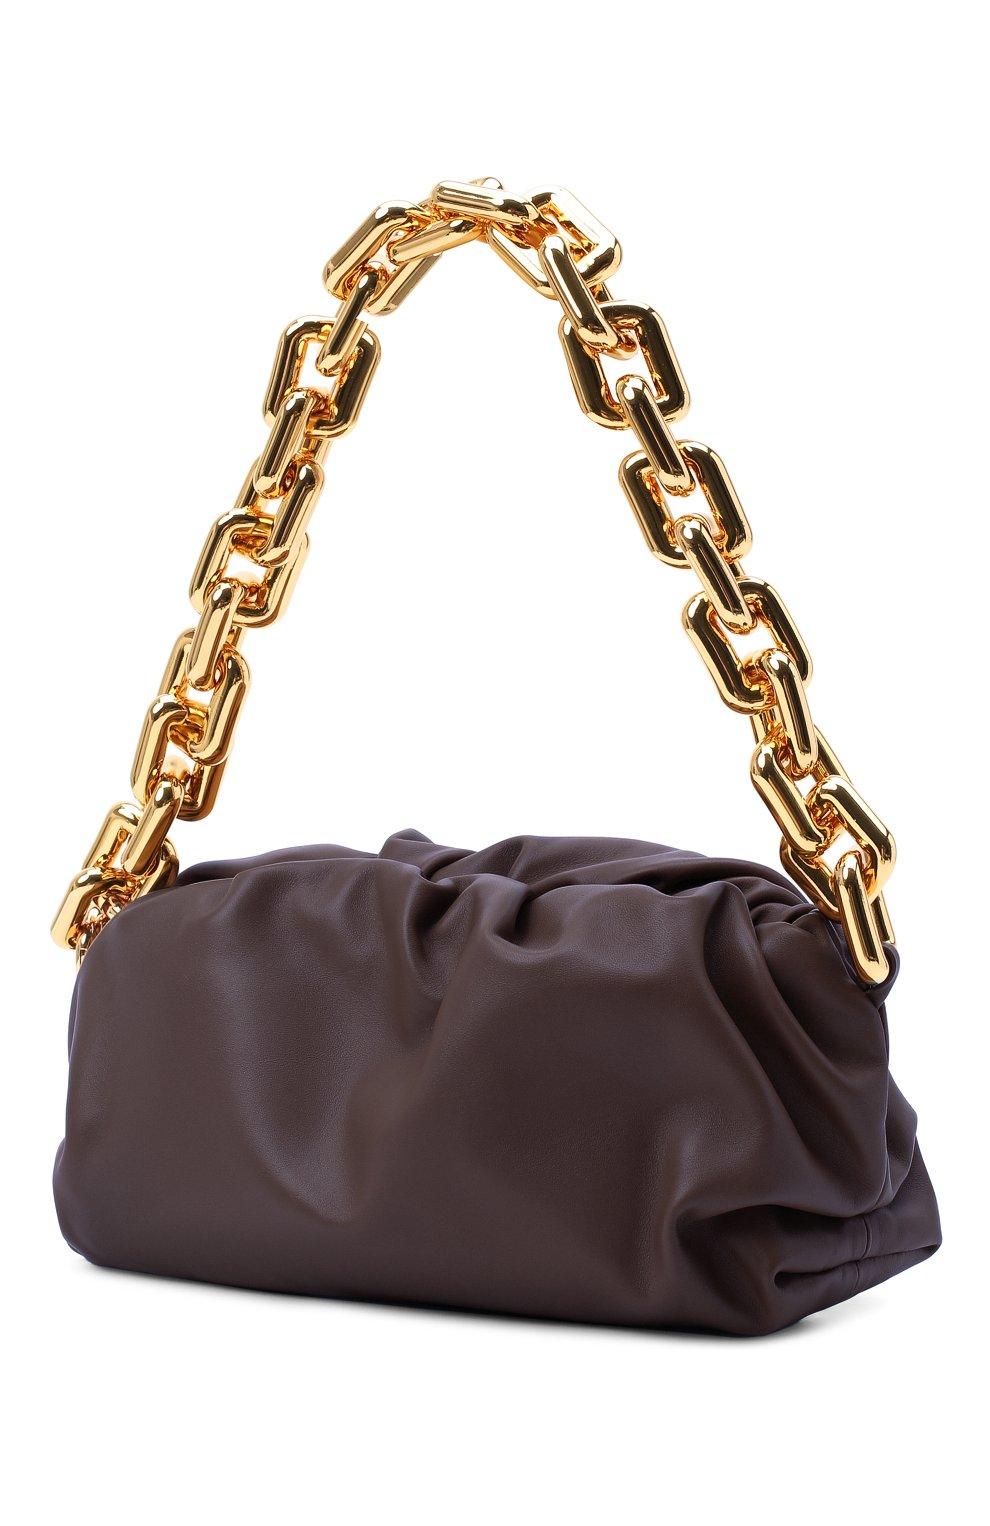 Женская сумка chain pouch BOTTEGA VENETA темно-фиолетового цвета, арт. 620230/VCP40 | Фото 3